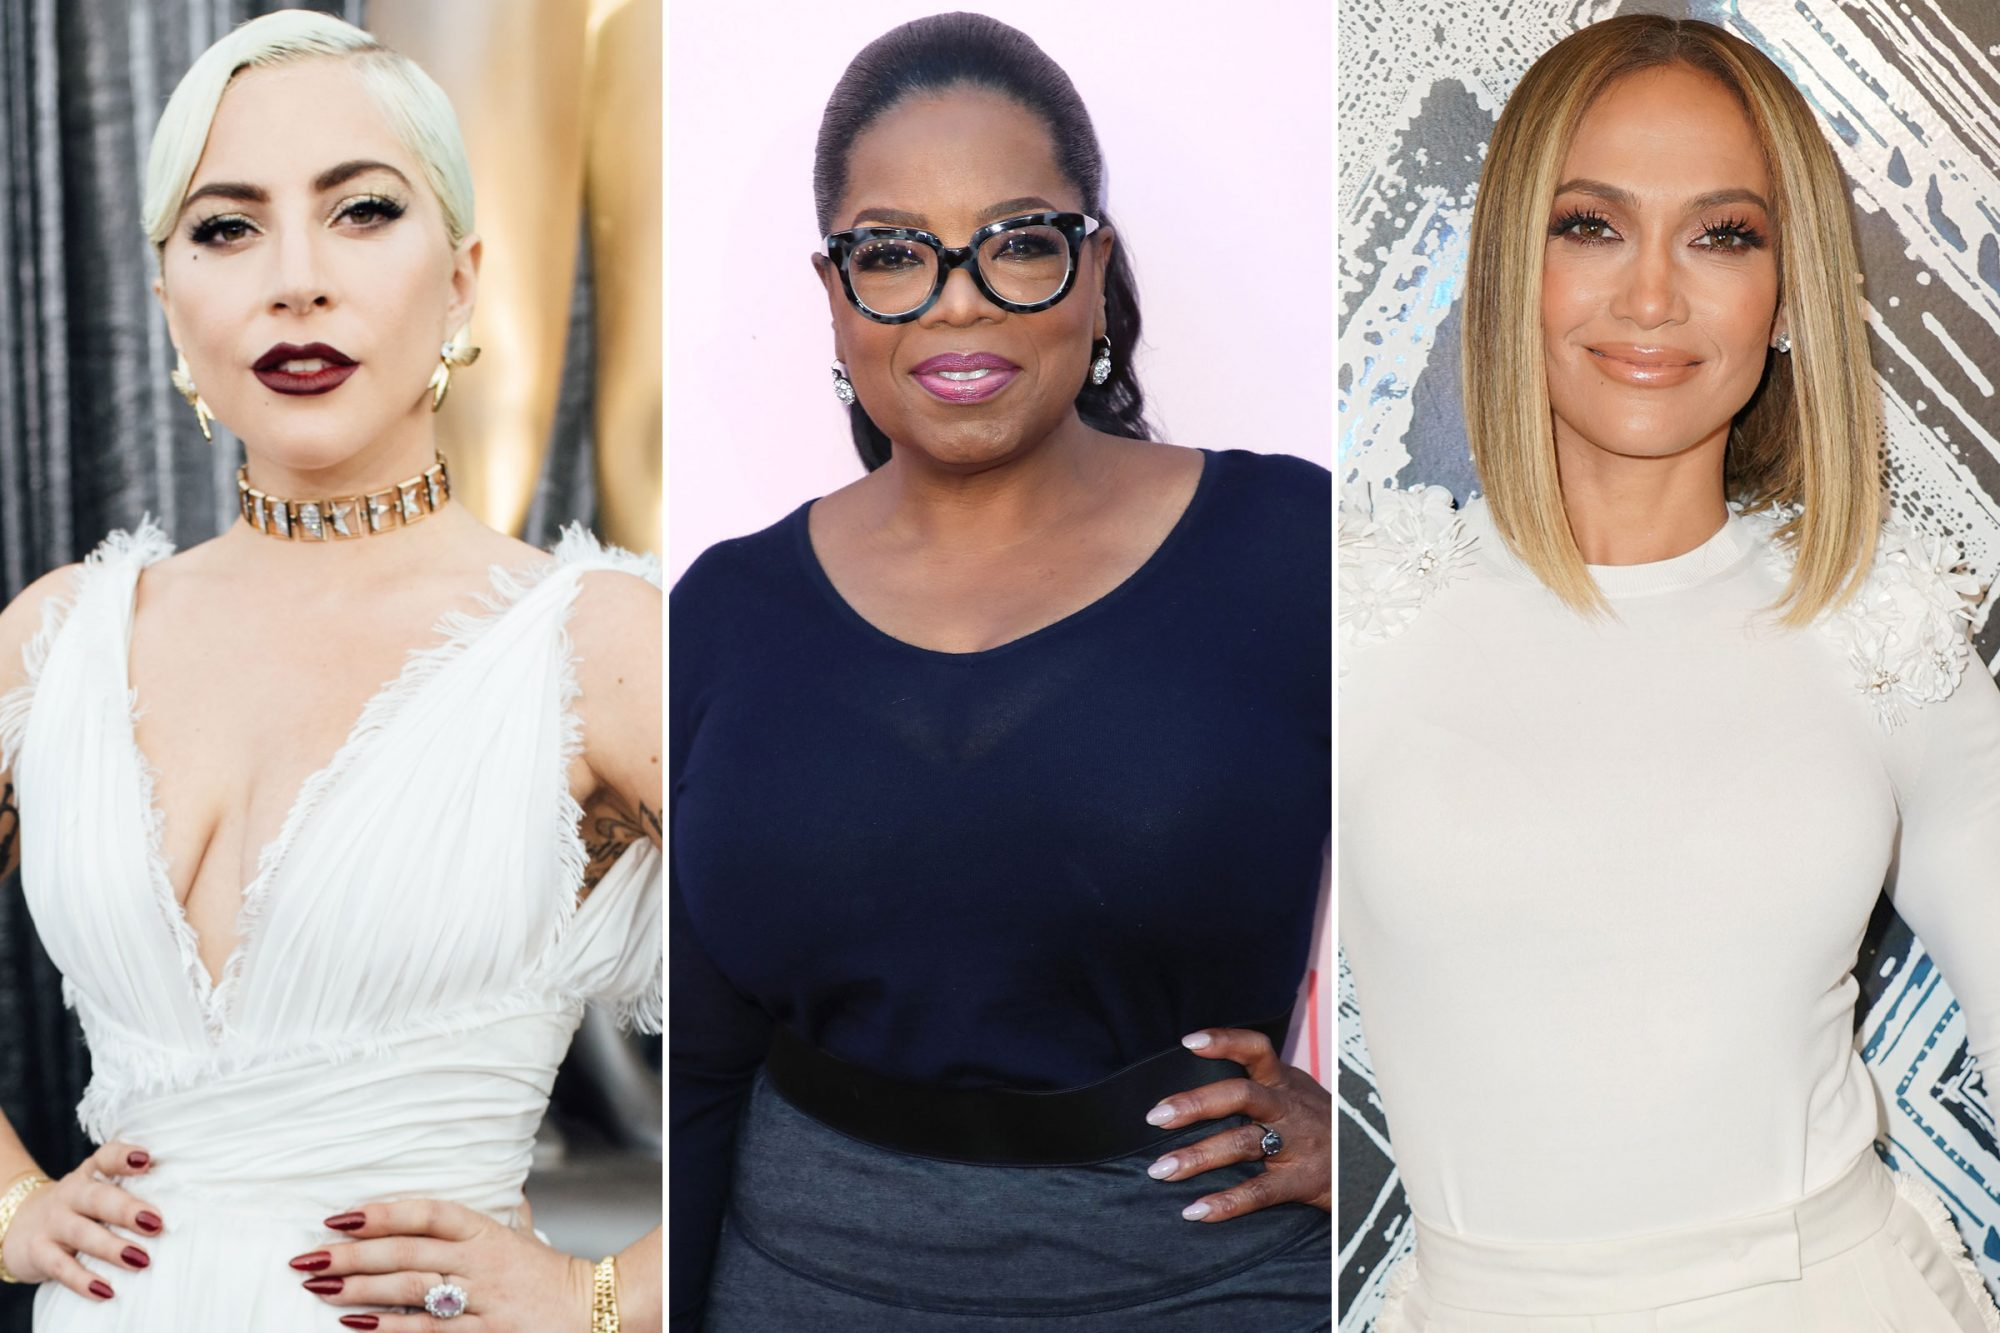 Lady Gaga; Oprah Winfrey; Jennifer Lopez